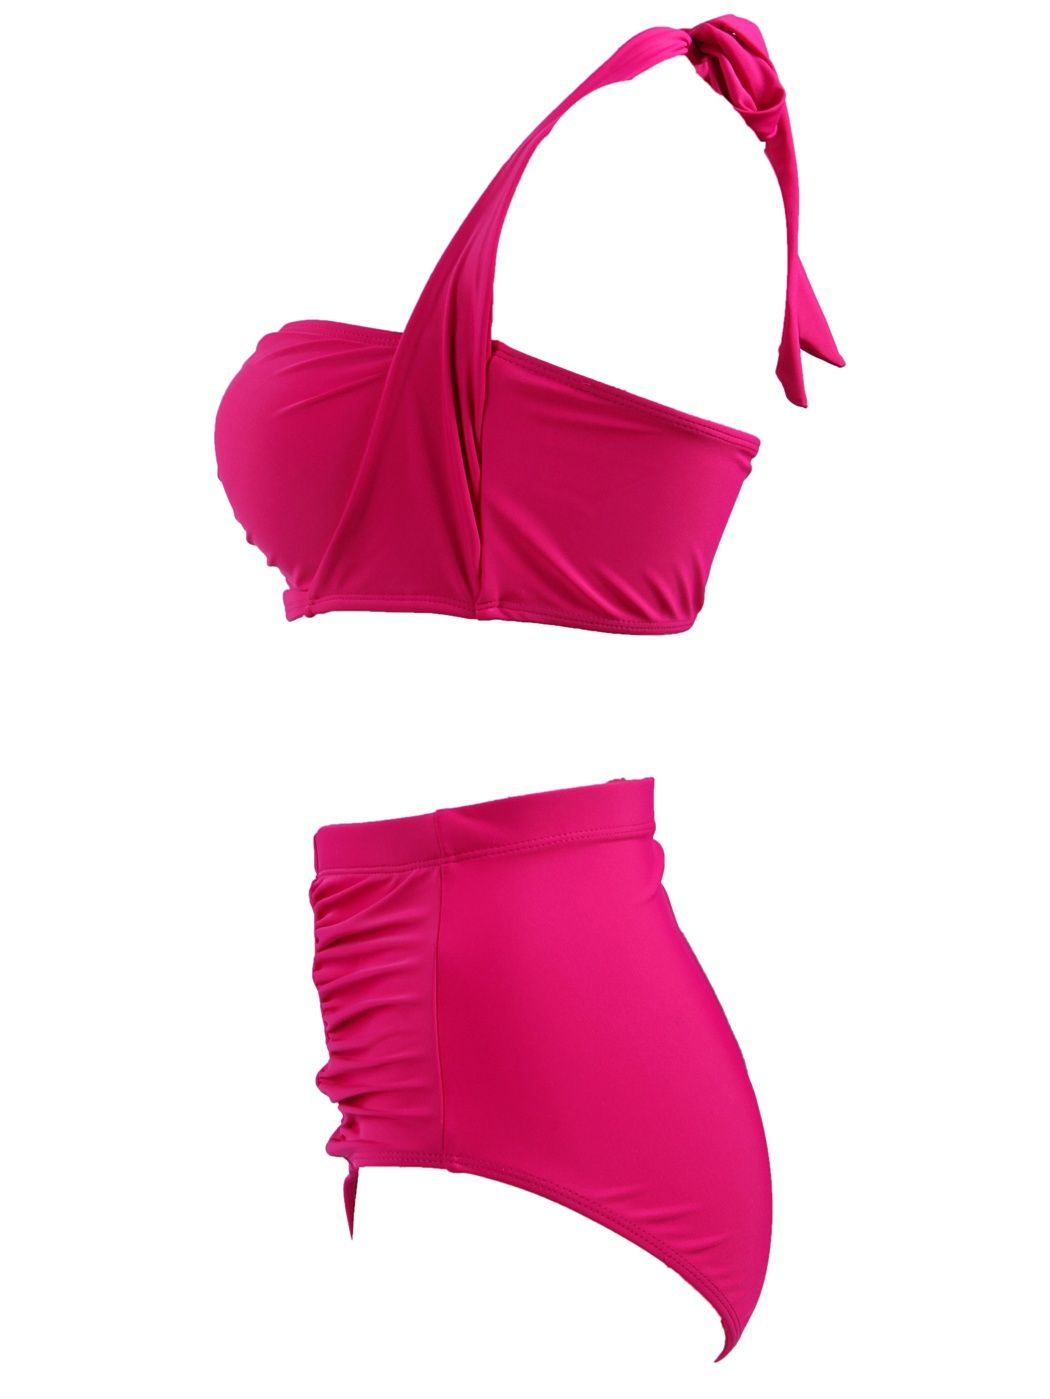 5481248057c71 HDE Women s Plus Size Retro Bikini Swimsuit Vintage High Waisted Pinup  Swimwear (Pink Halter